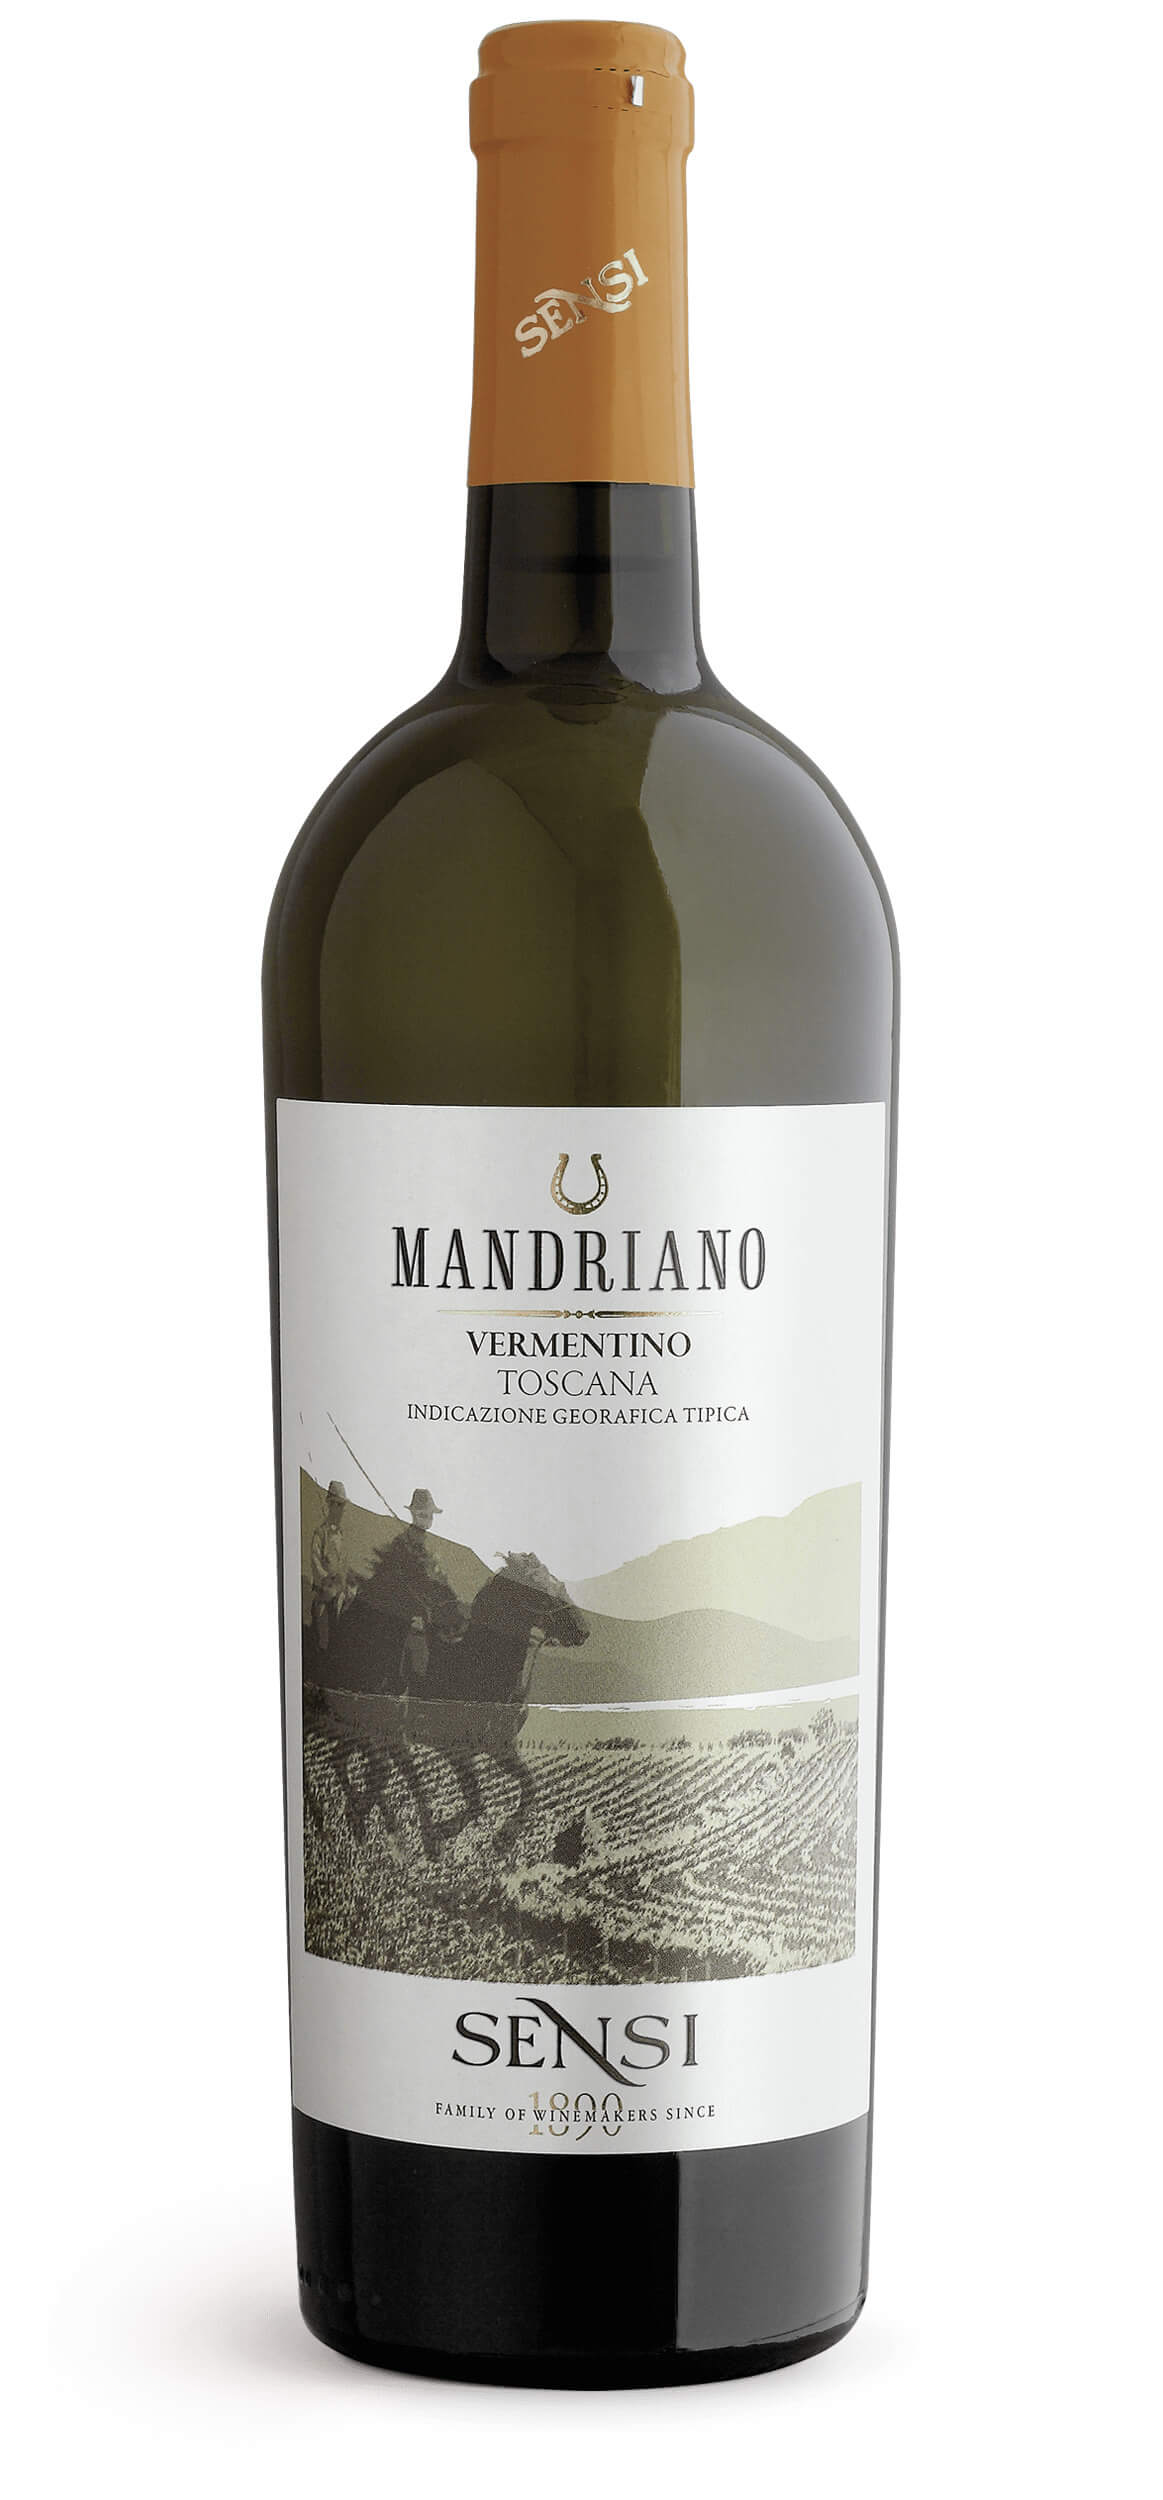 Sensi Classica Mandriano bianco